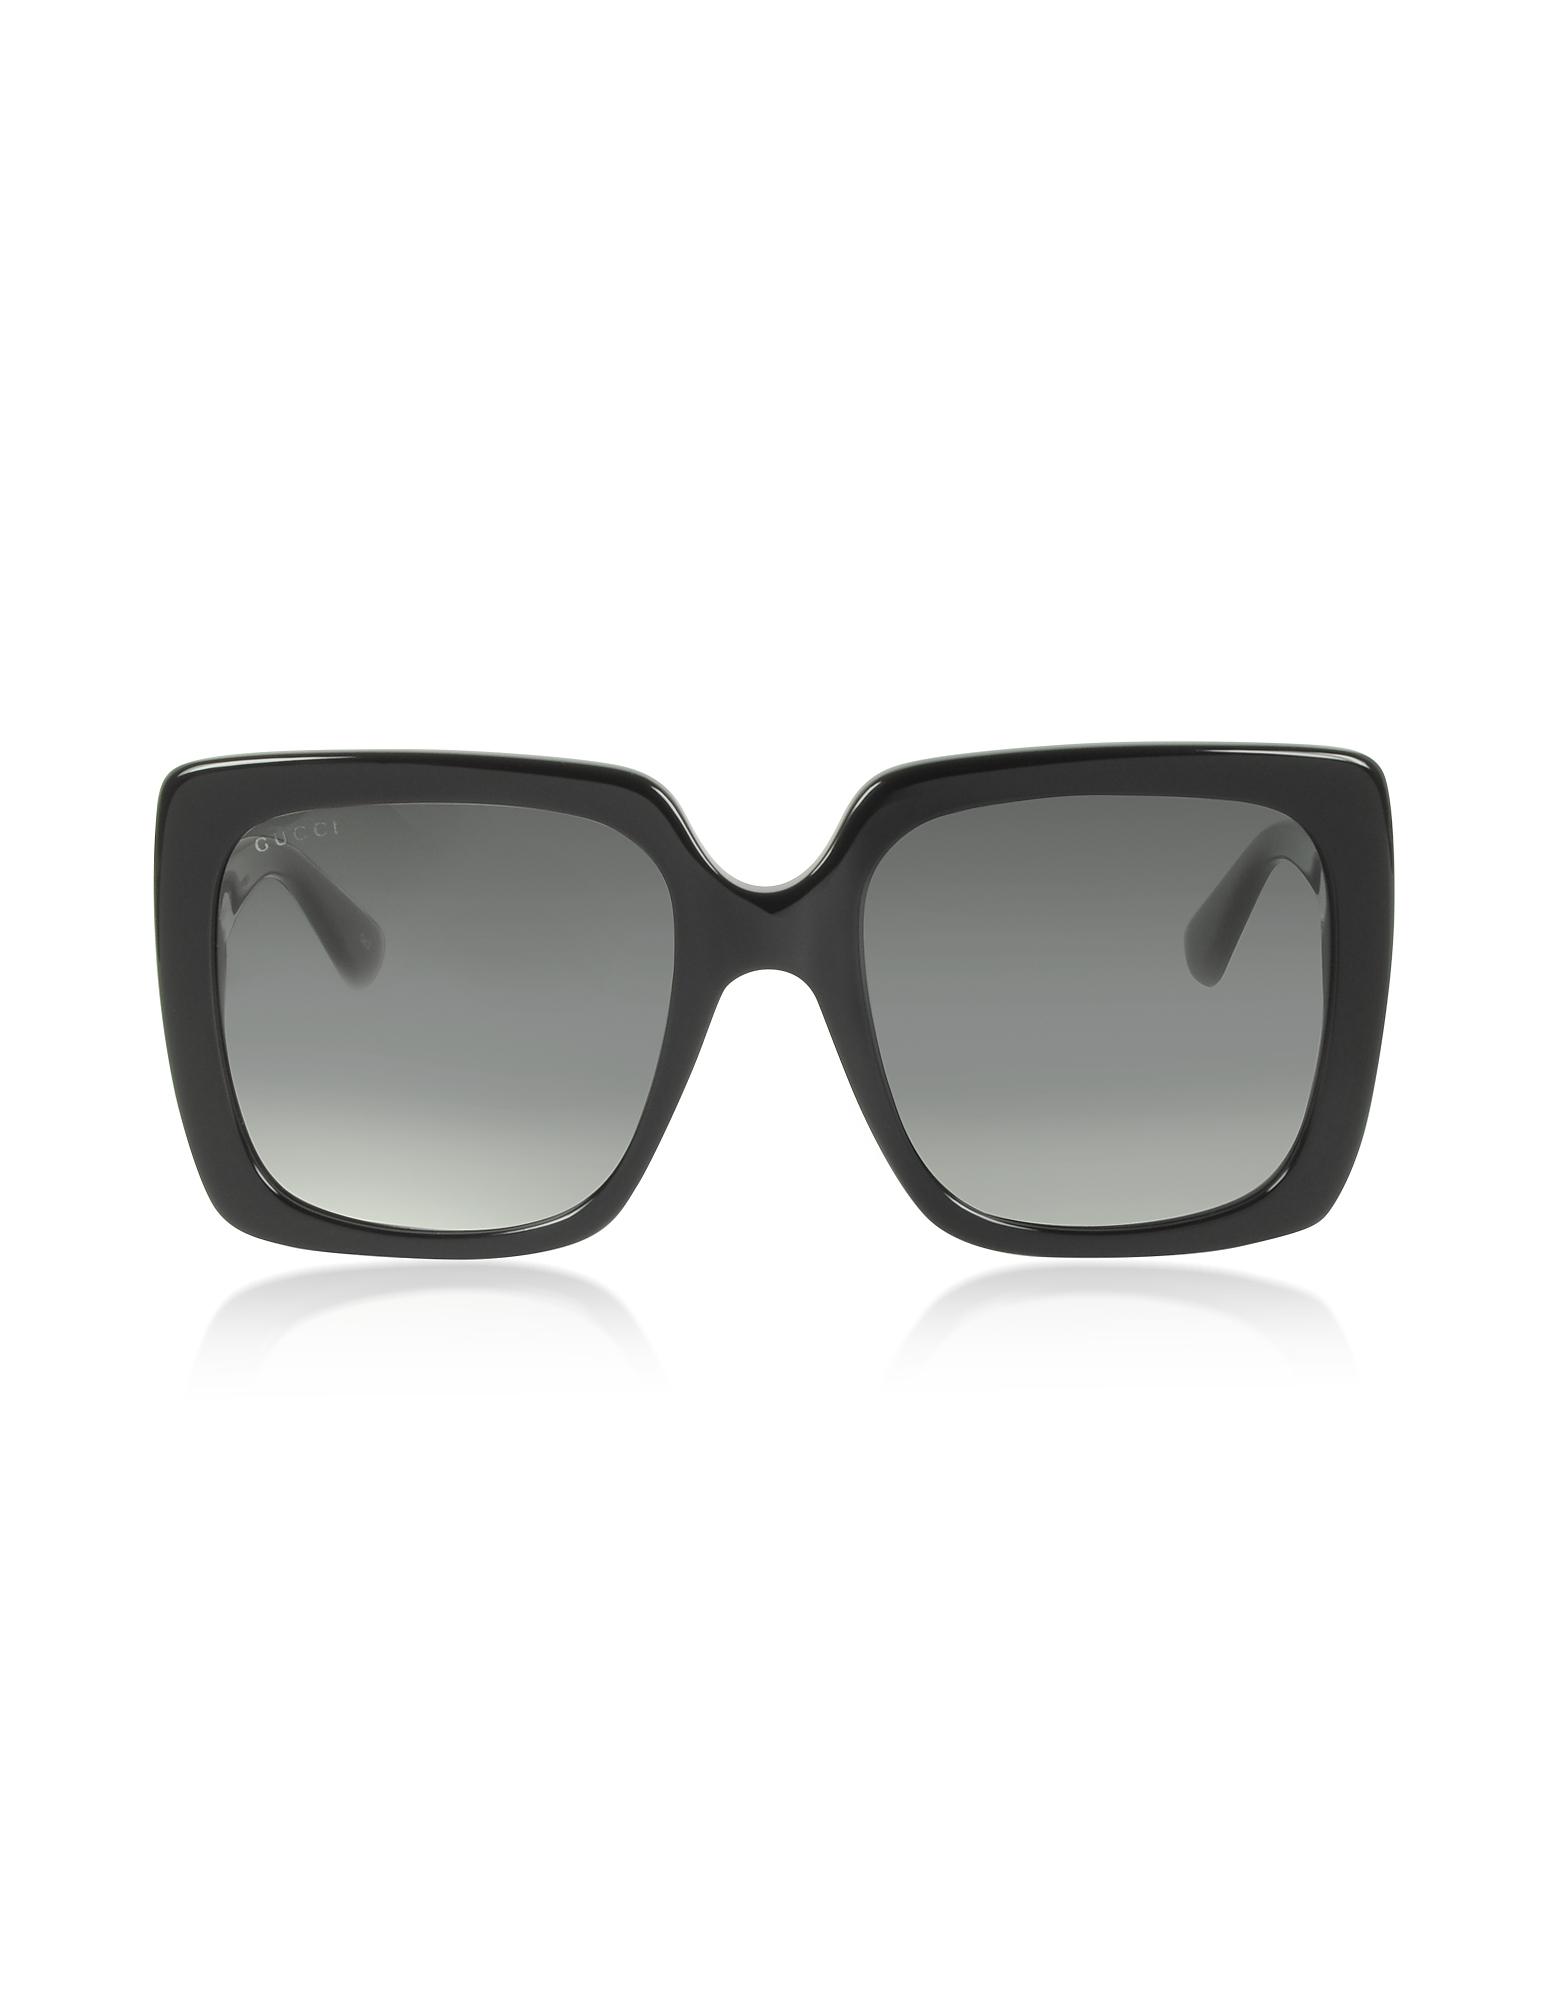 GG0418S Rectangular-frame Acetate Sunglasses